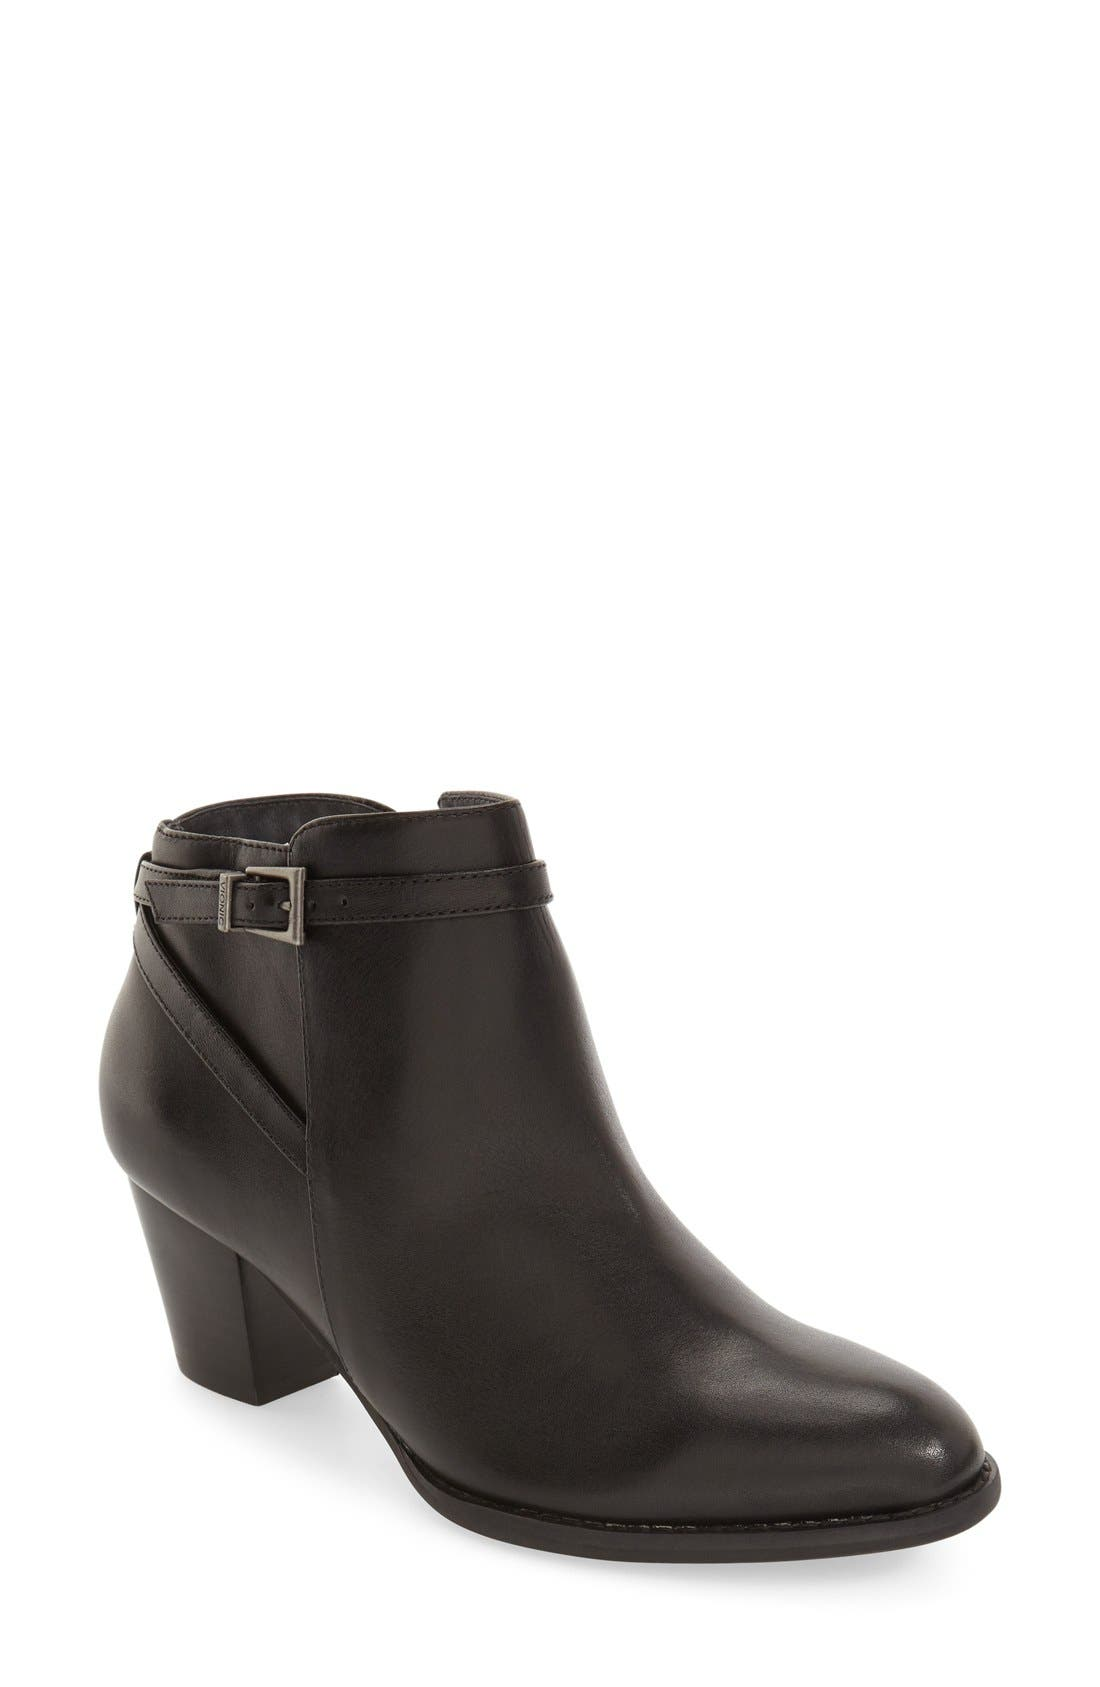 'Upton' Block Heel Boot,                             Main thumbnail 1, color,                             Black Leather